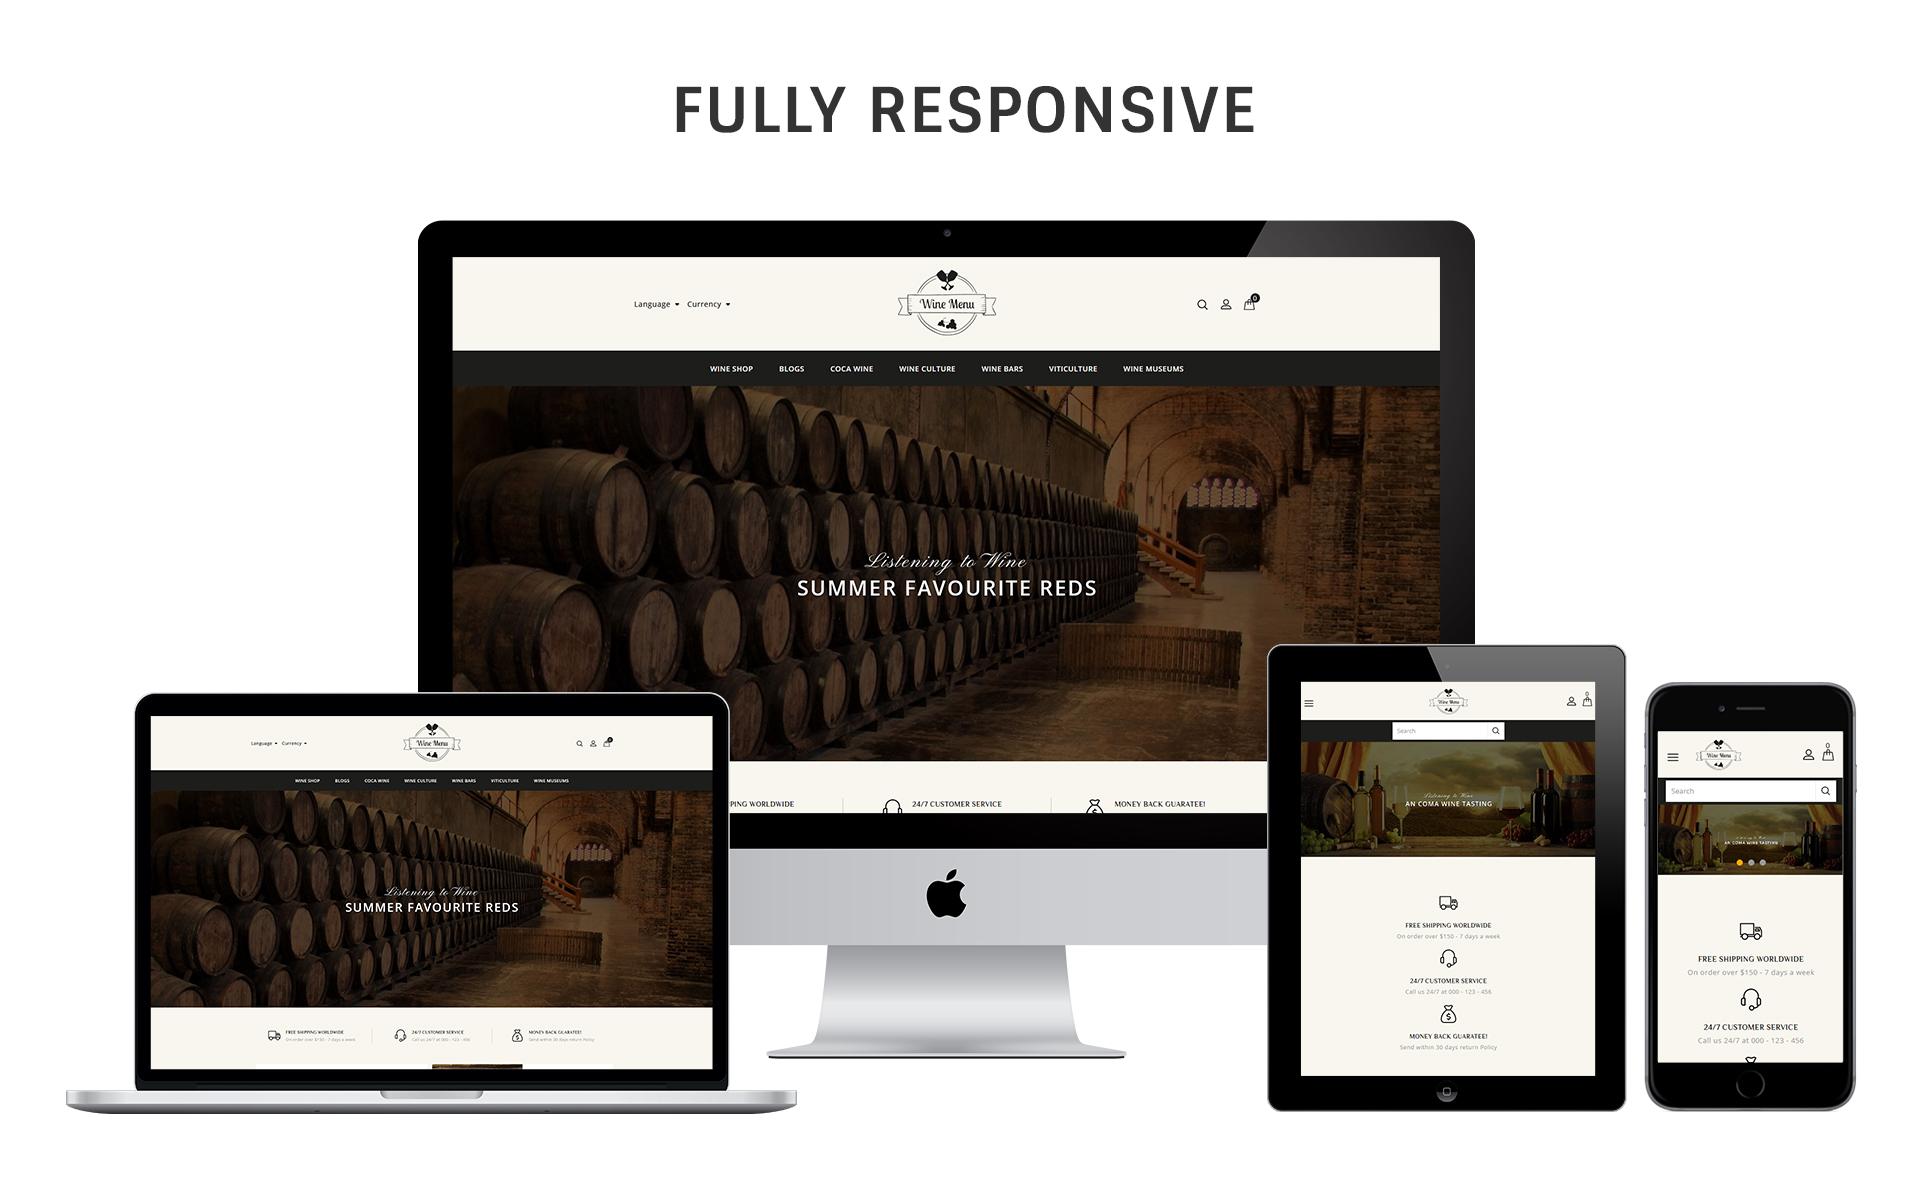 WineMenu - The Wine Shop Responsive OpenCart Template